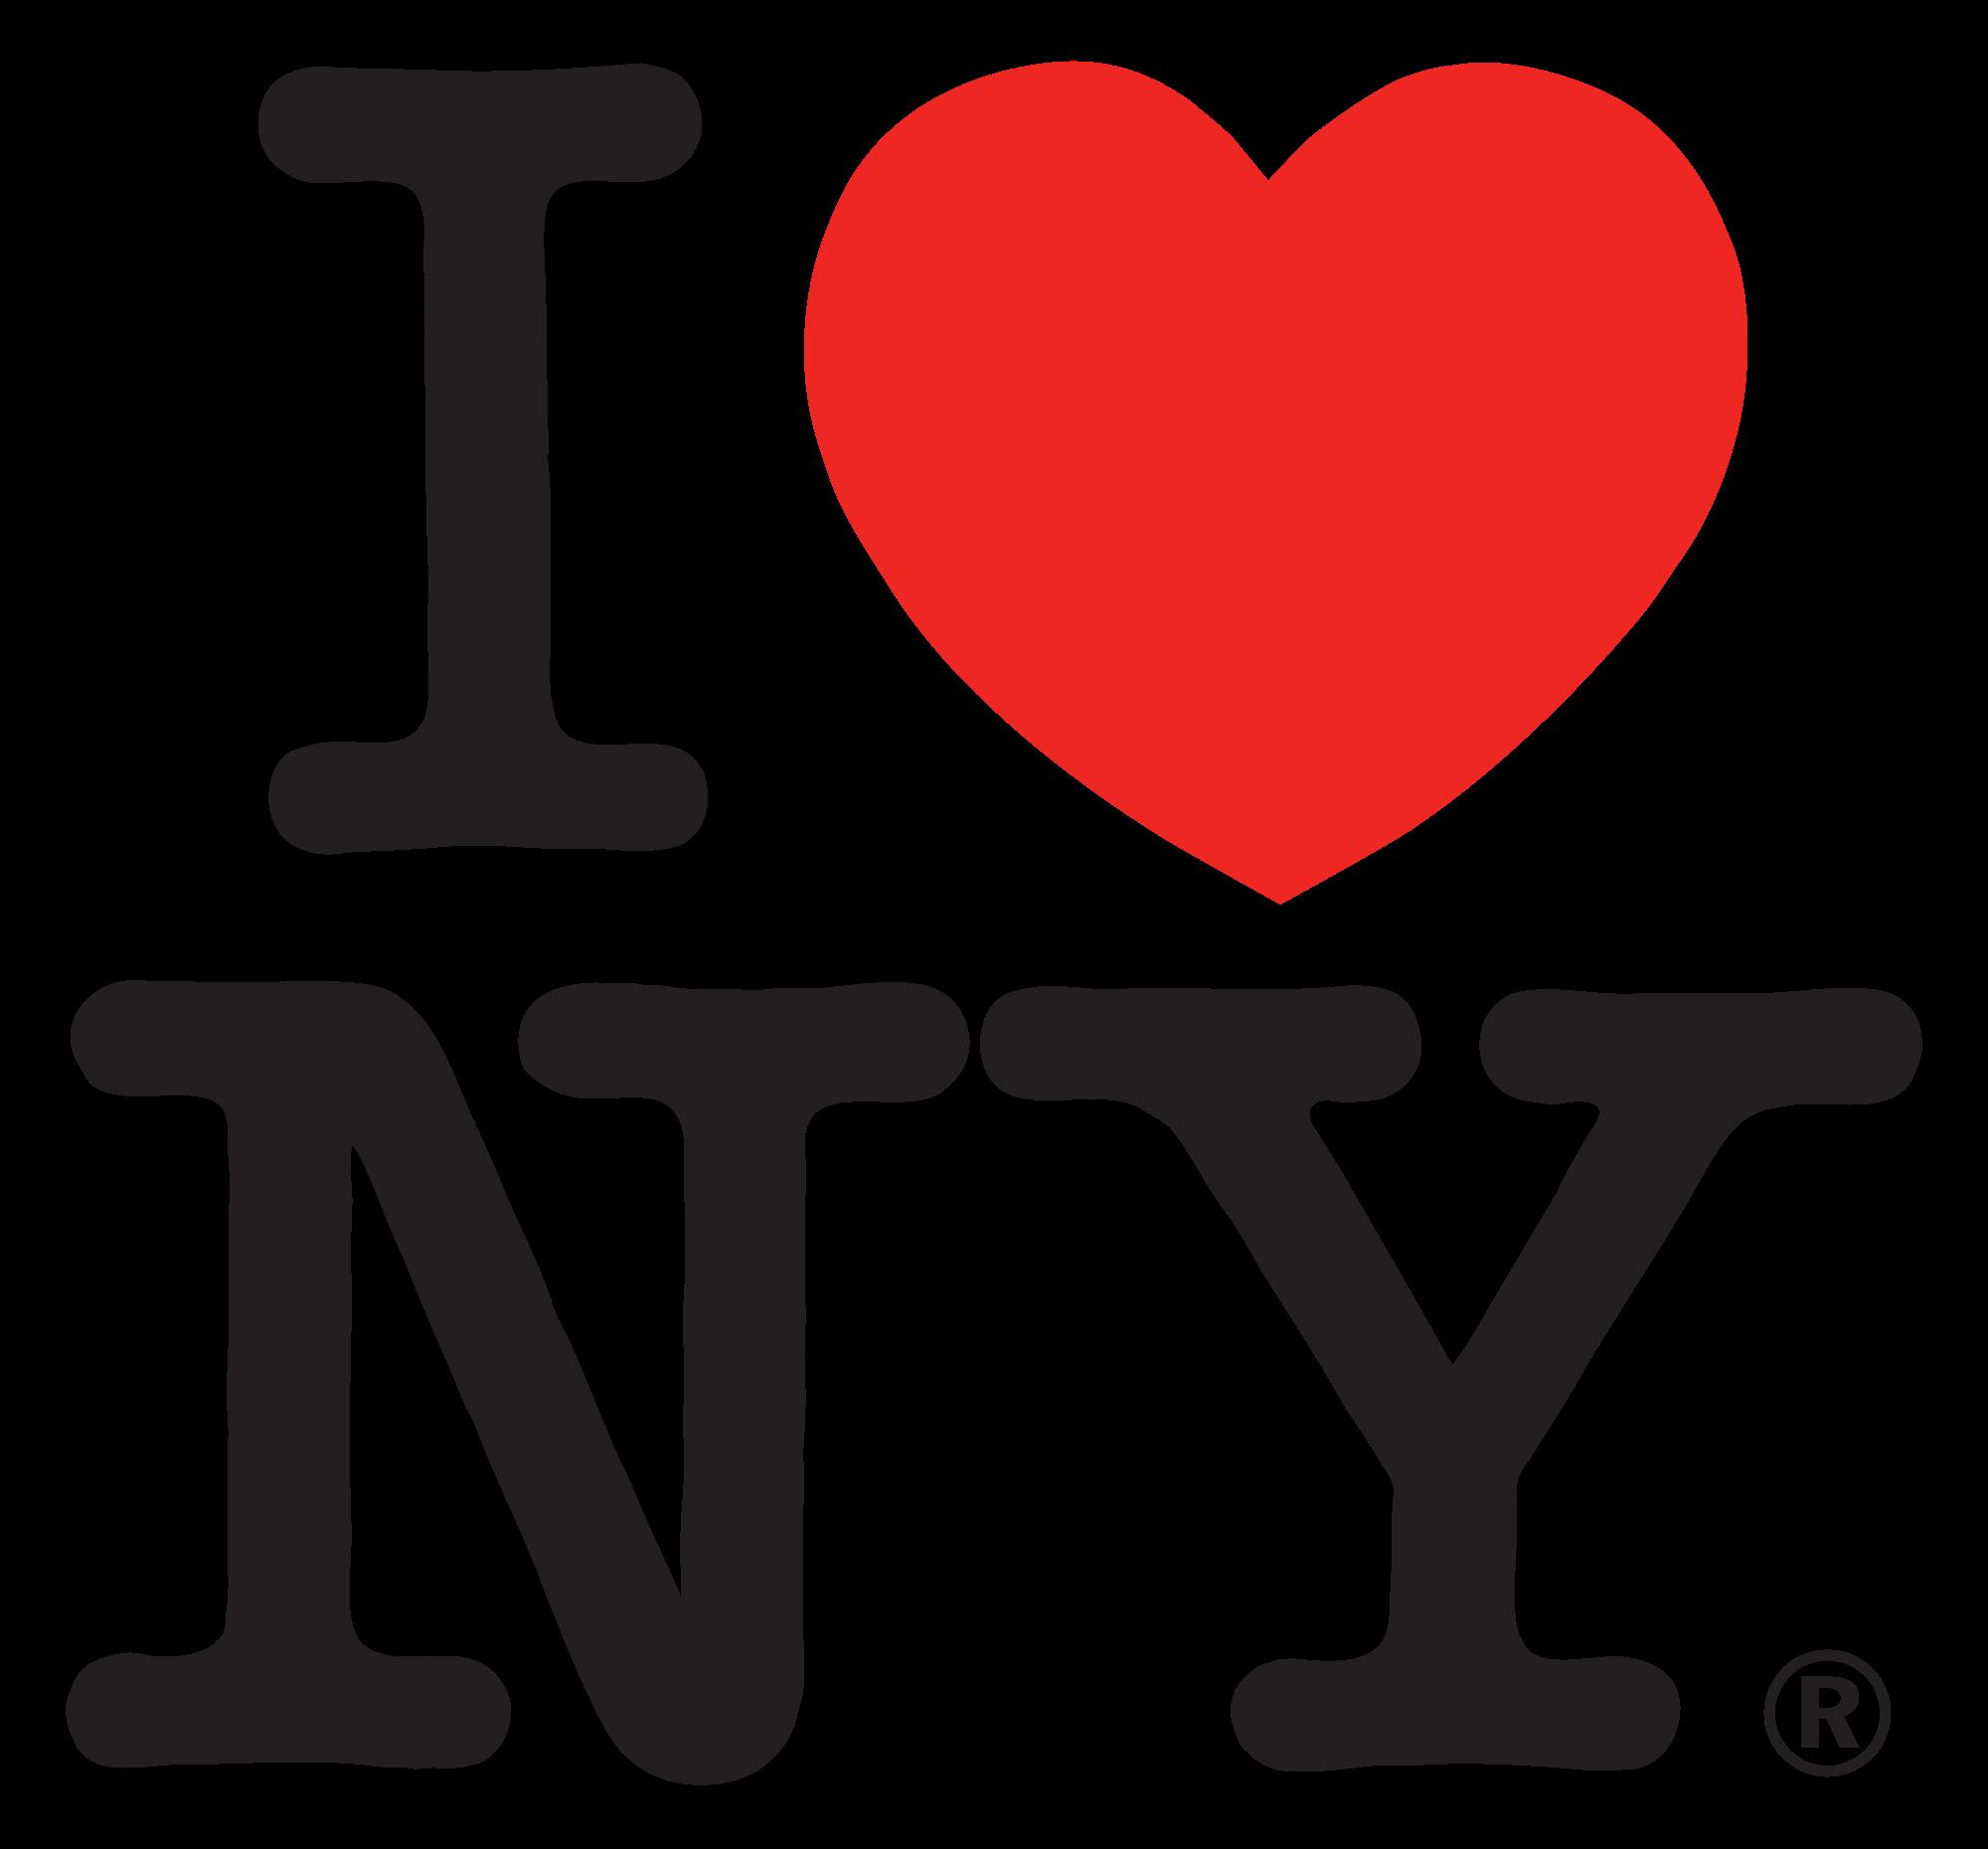 The iconic logo designed by Milton Glaser